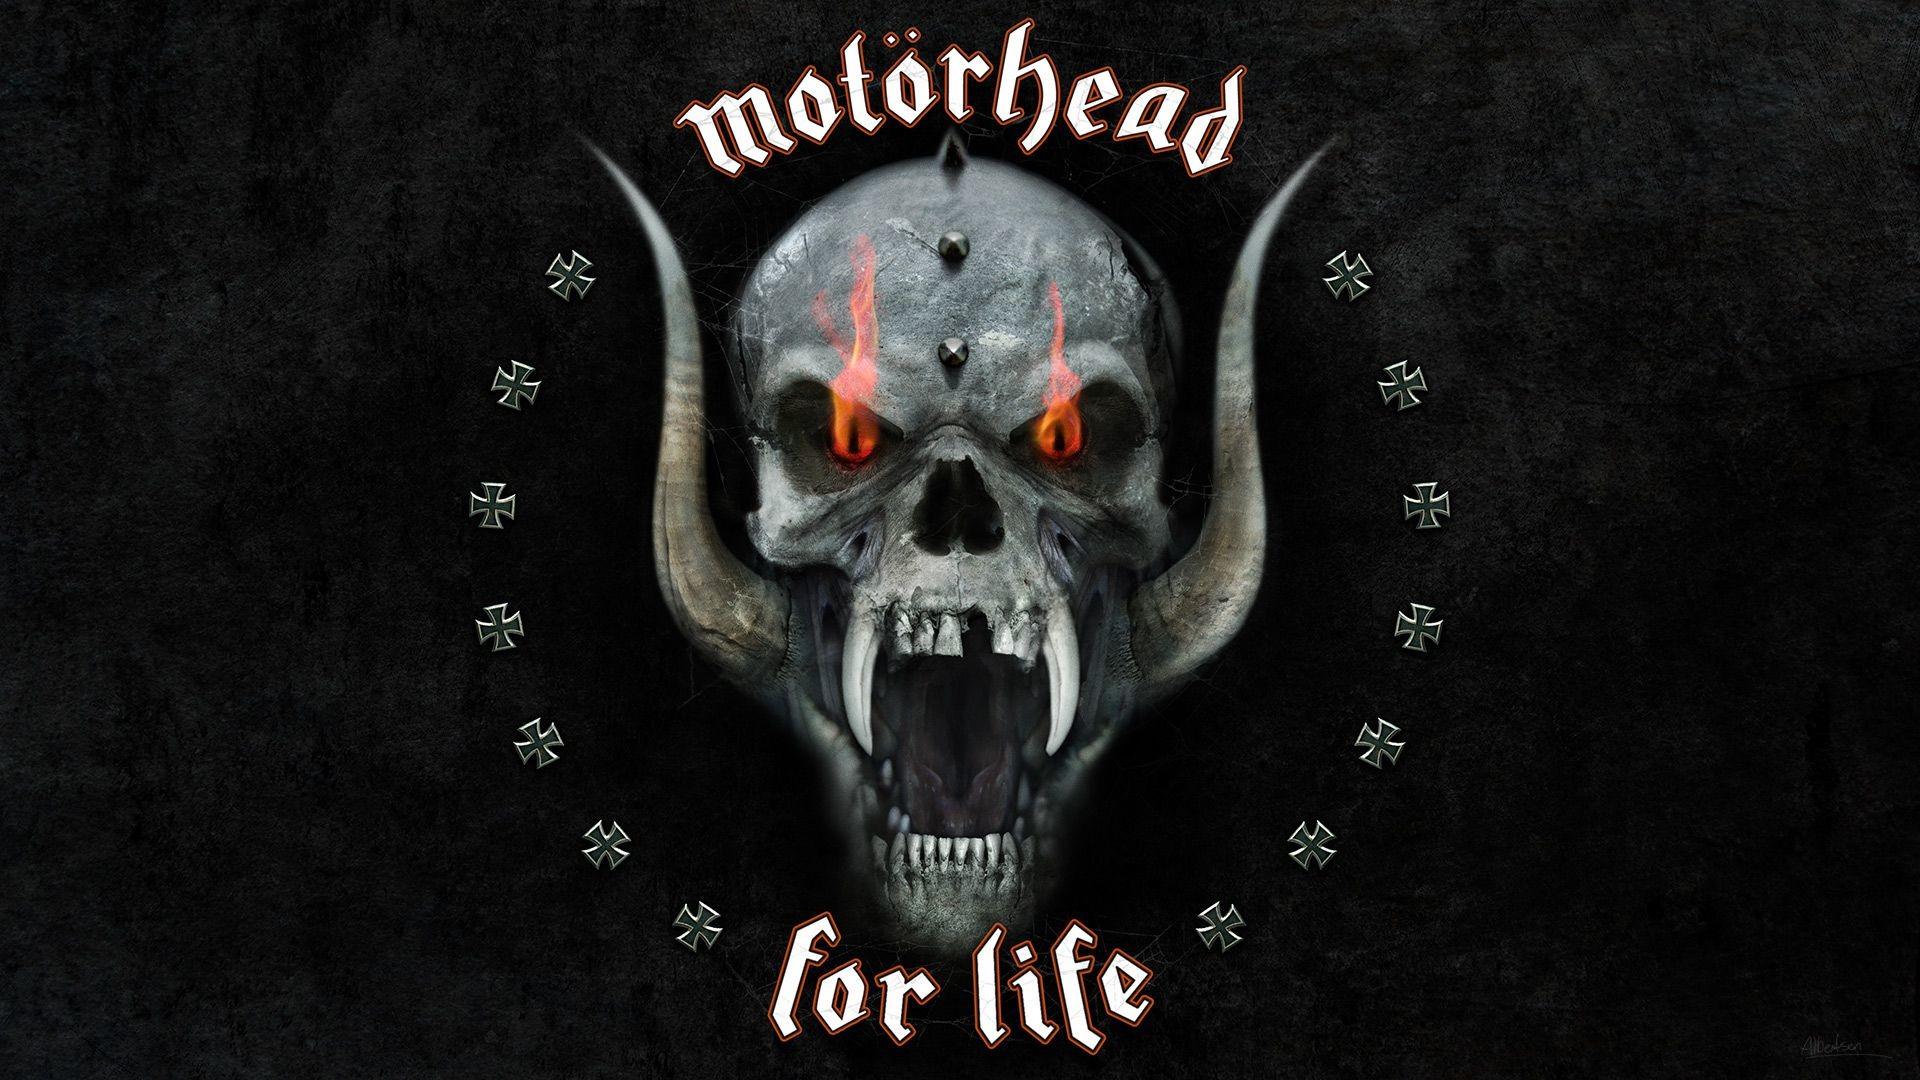 Res: 1920x1080, Motörhead wallpaper -  #motorheadforlife #Lemmy #Motorhead